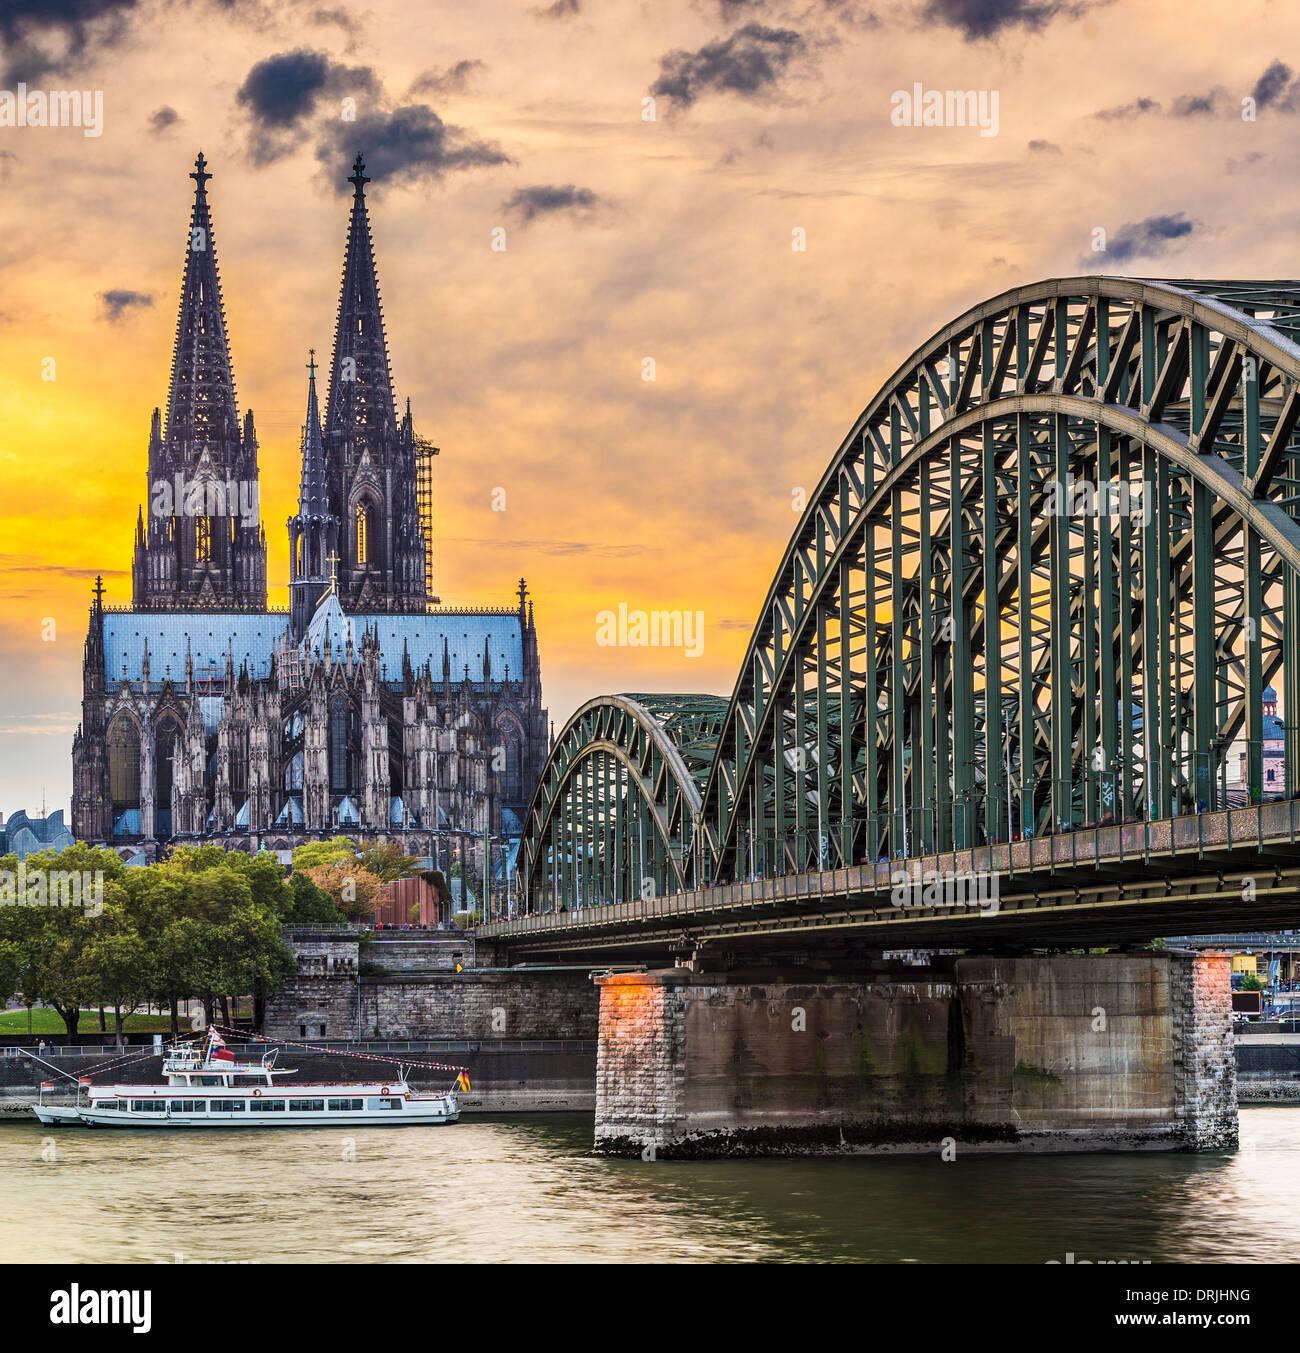 Köln am Dom und Brücke über den Rhein. Stockbild